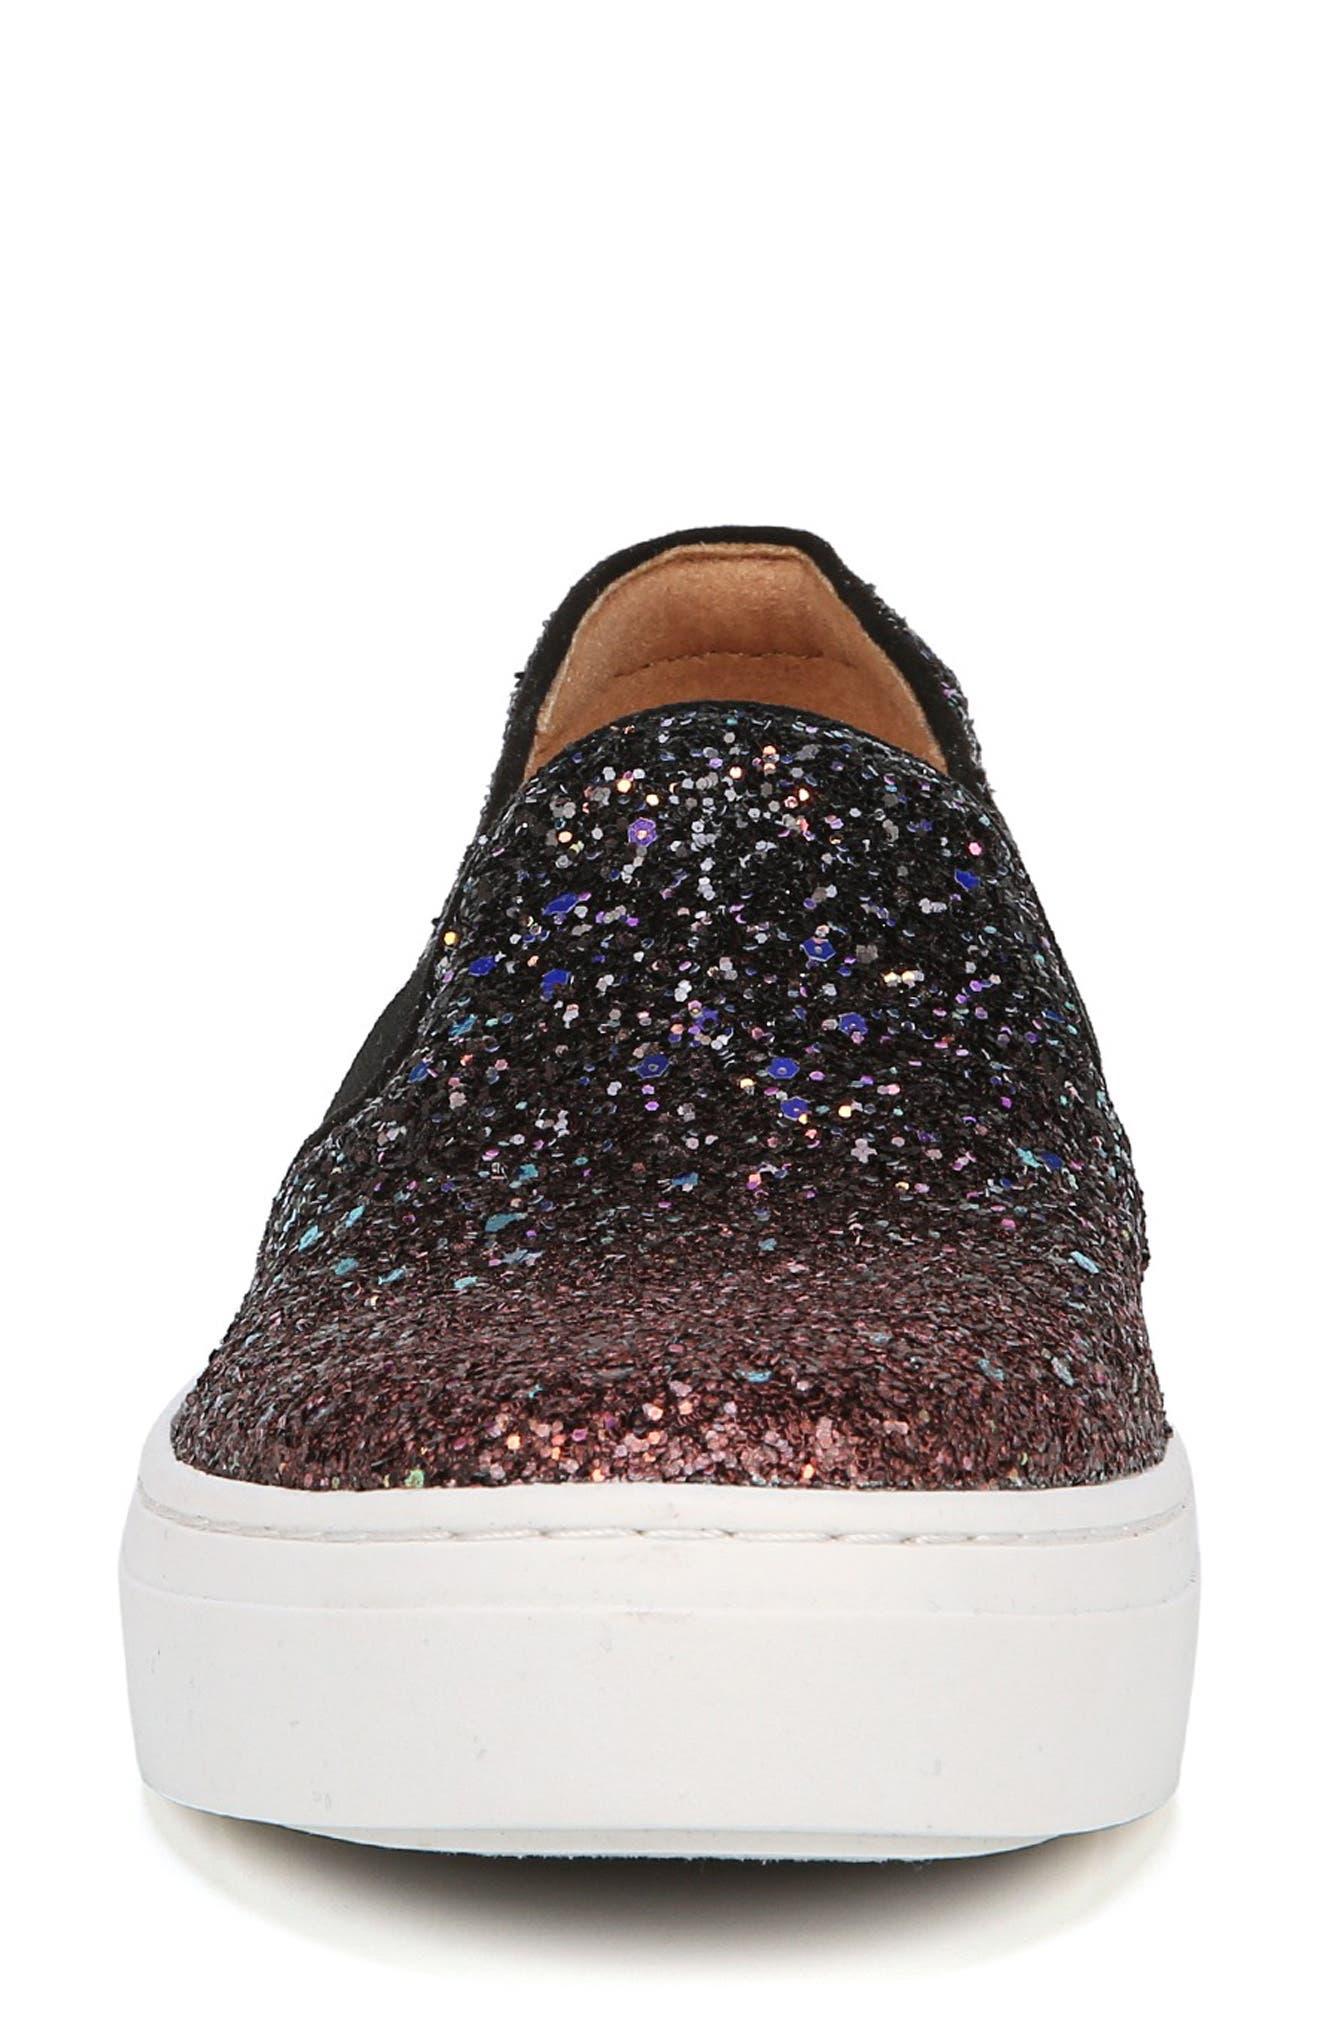 NATURALIZER, Carly Slip-On Sneaker, Alternate thumbnail 3, color, MULTI GLITTER FABRIC